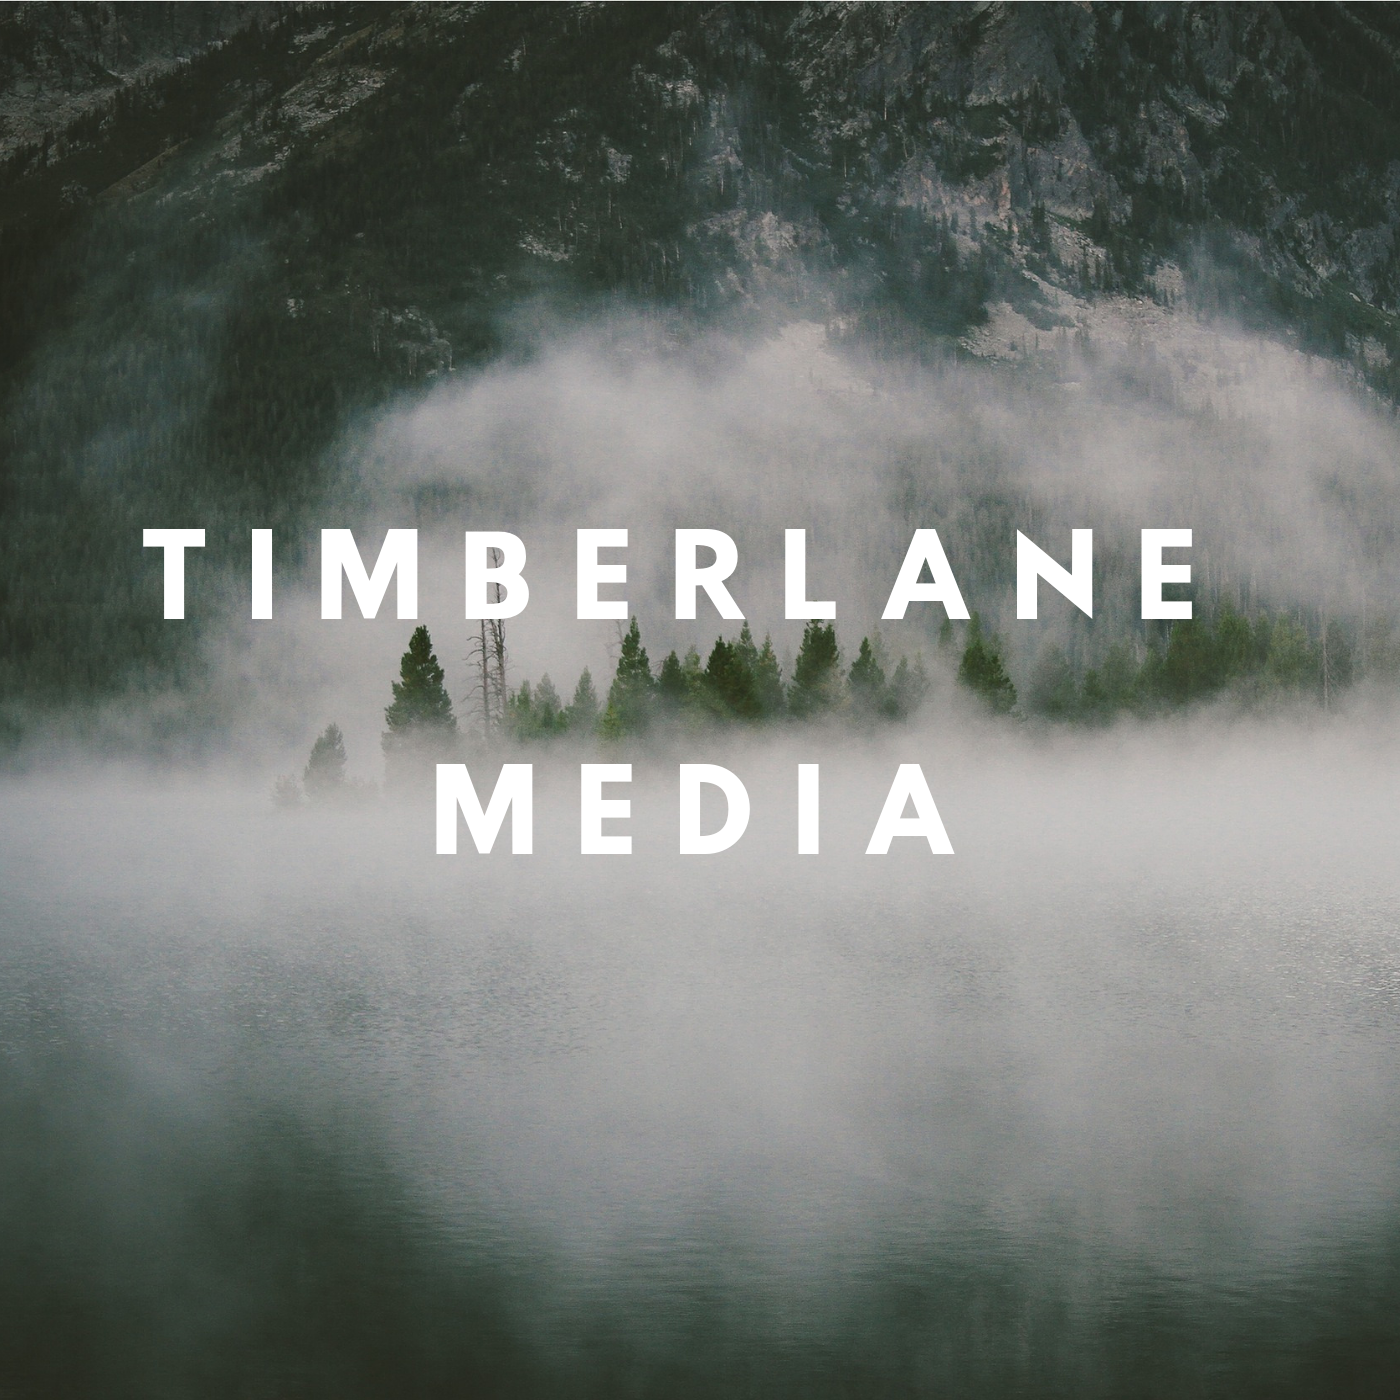 Timberlane Media show art